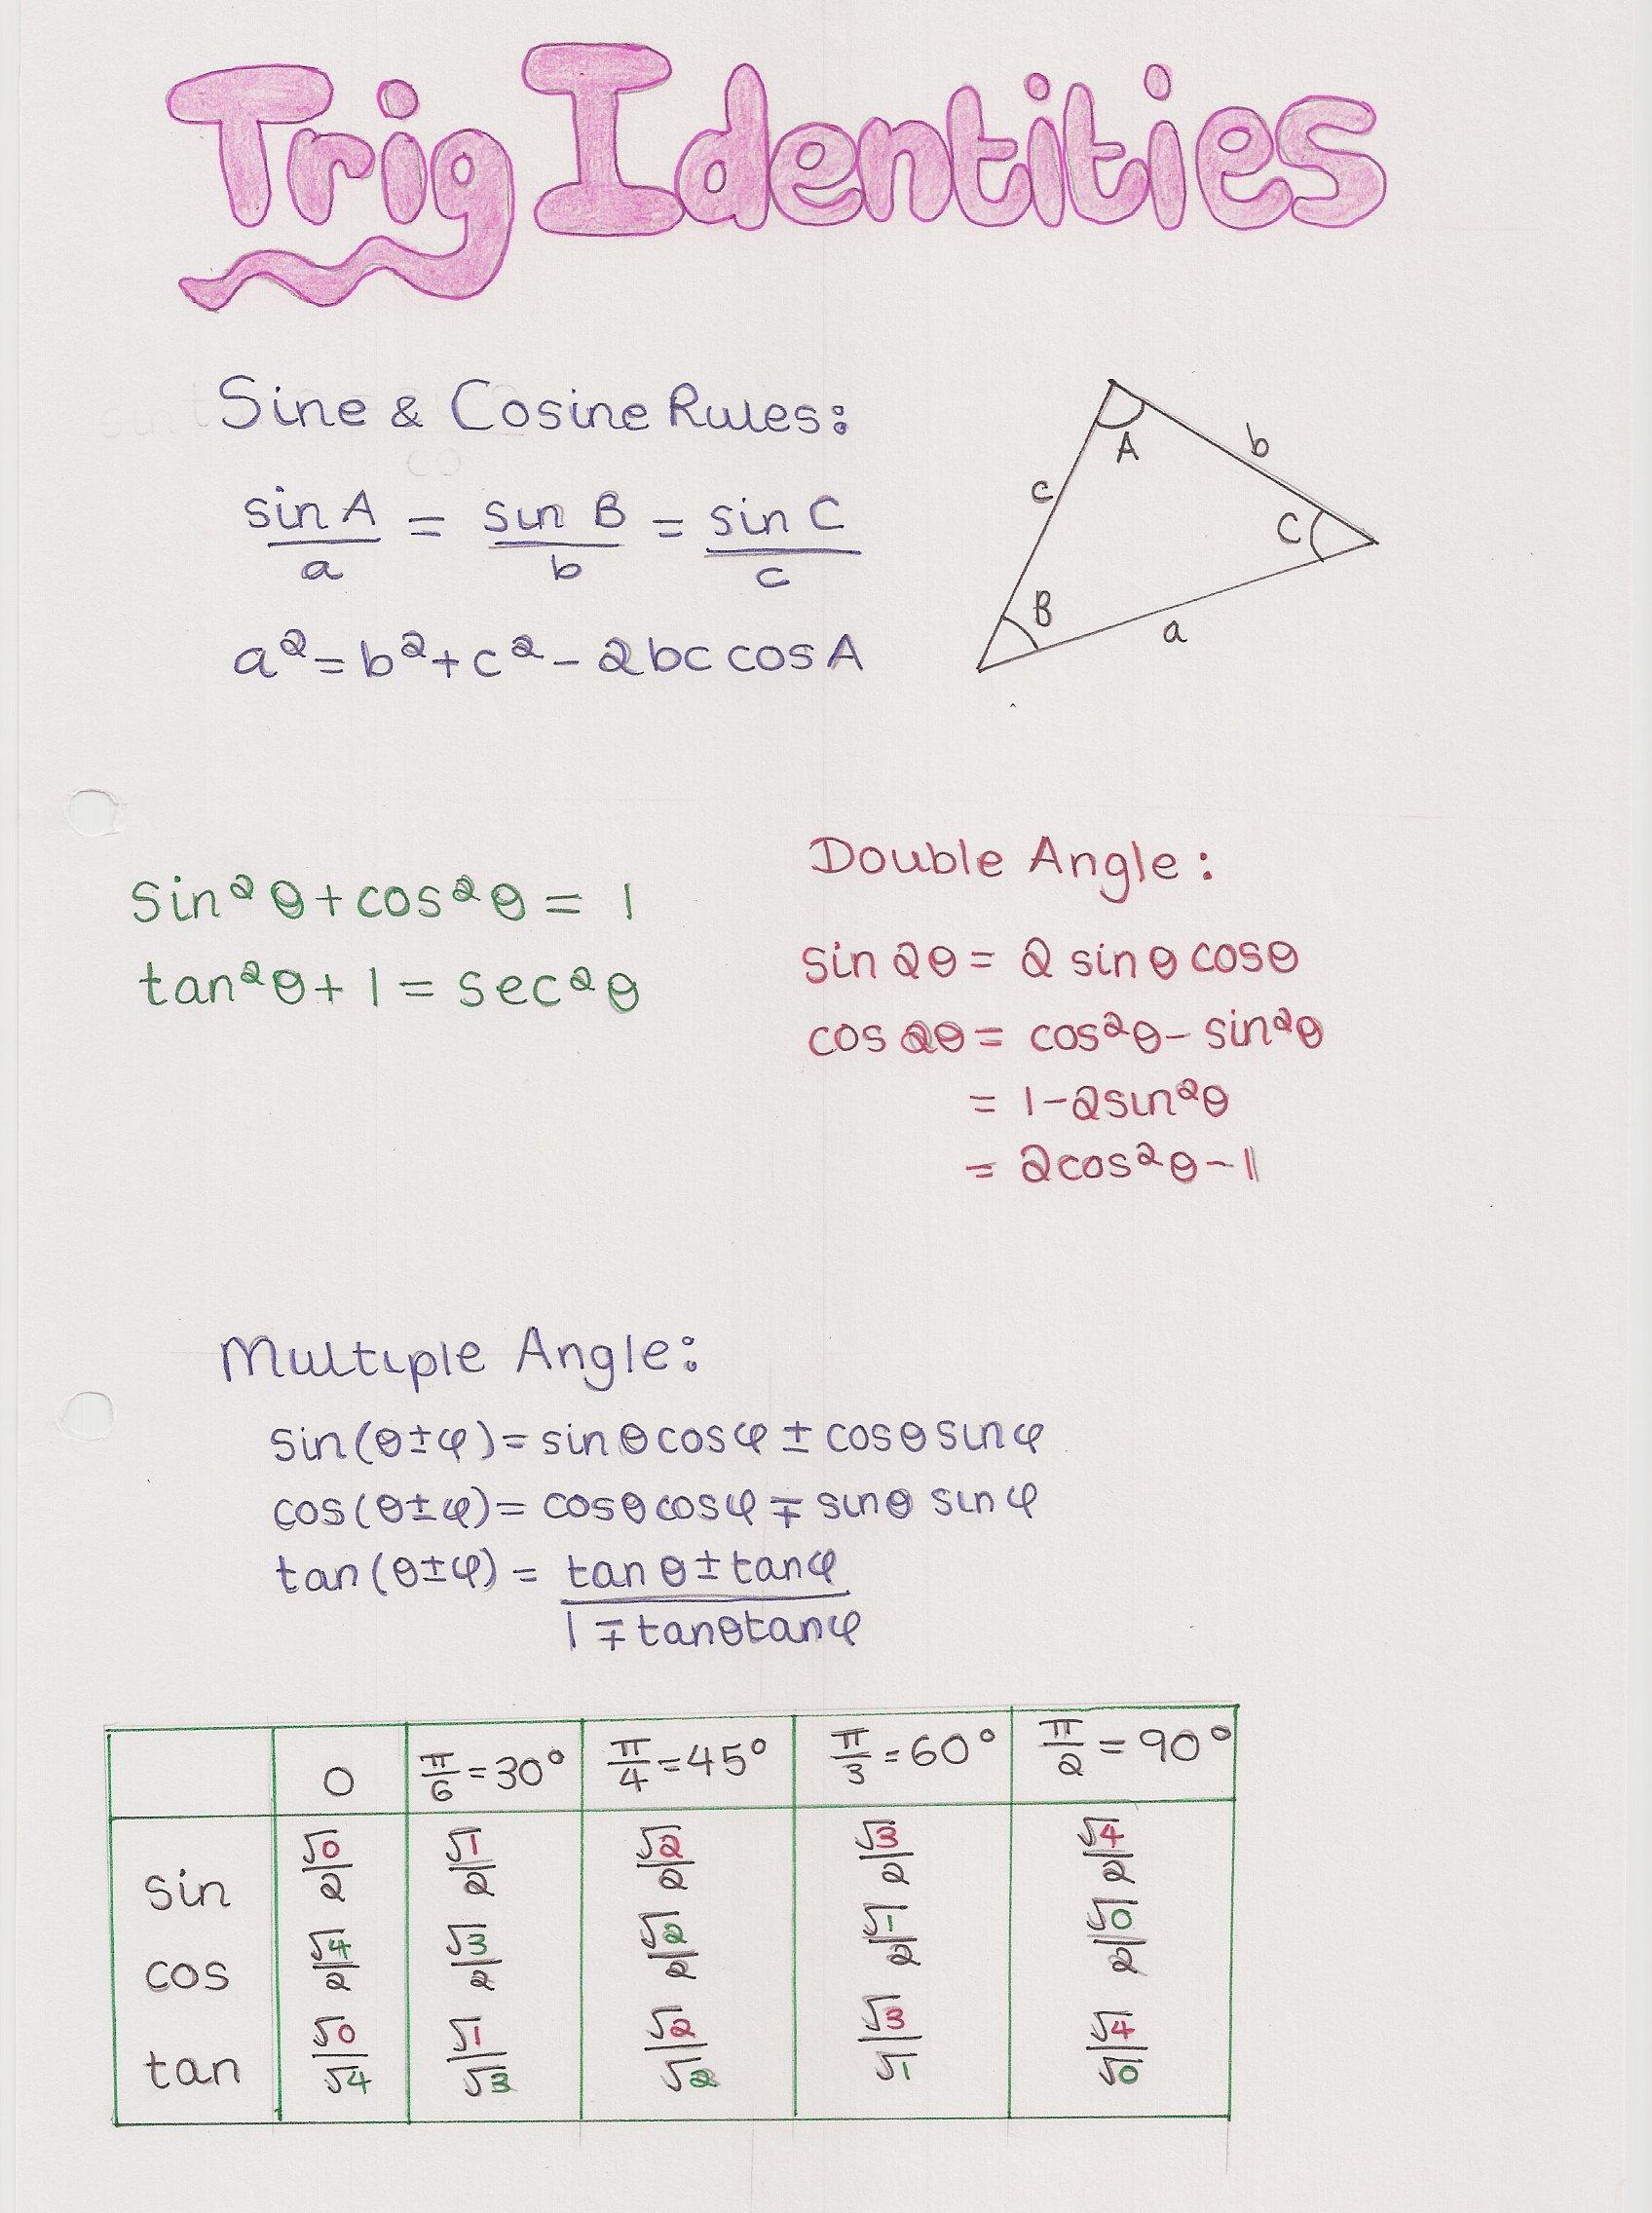 Trig Identities Cheat Sheet Formula Pre Algebra Formulas Cheat Sheet